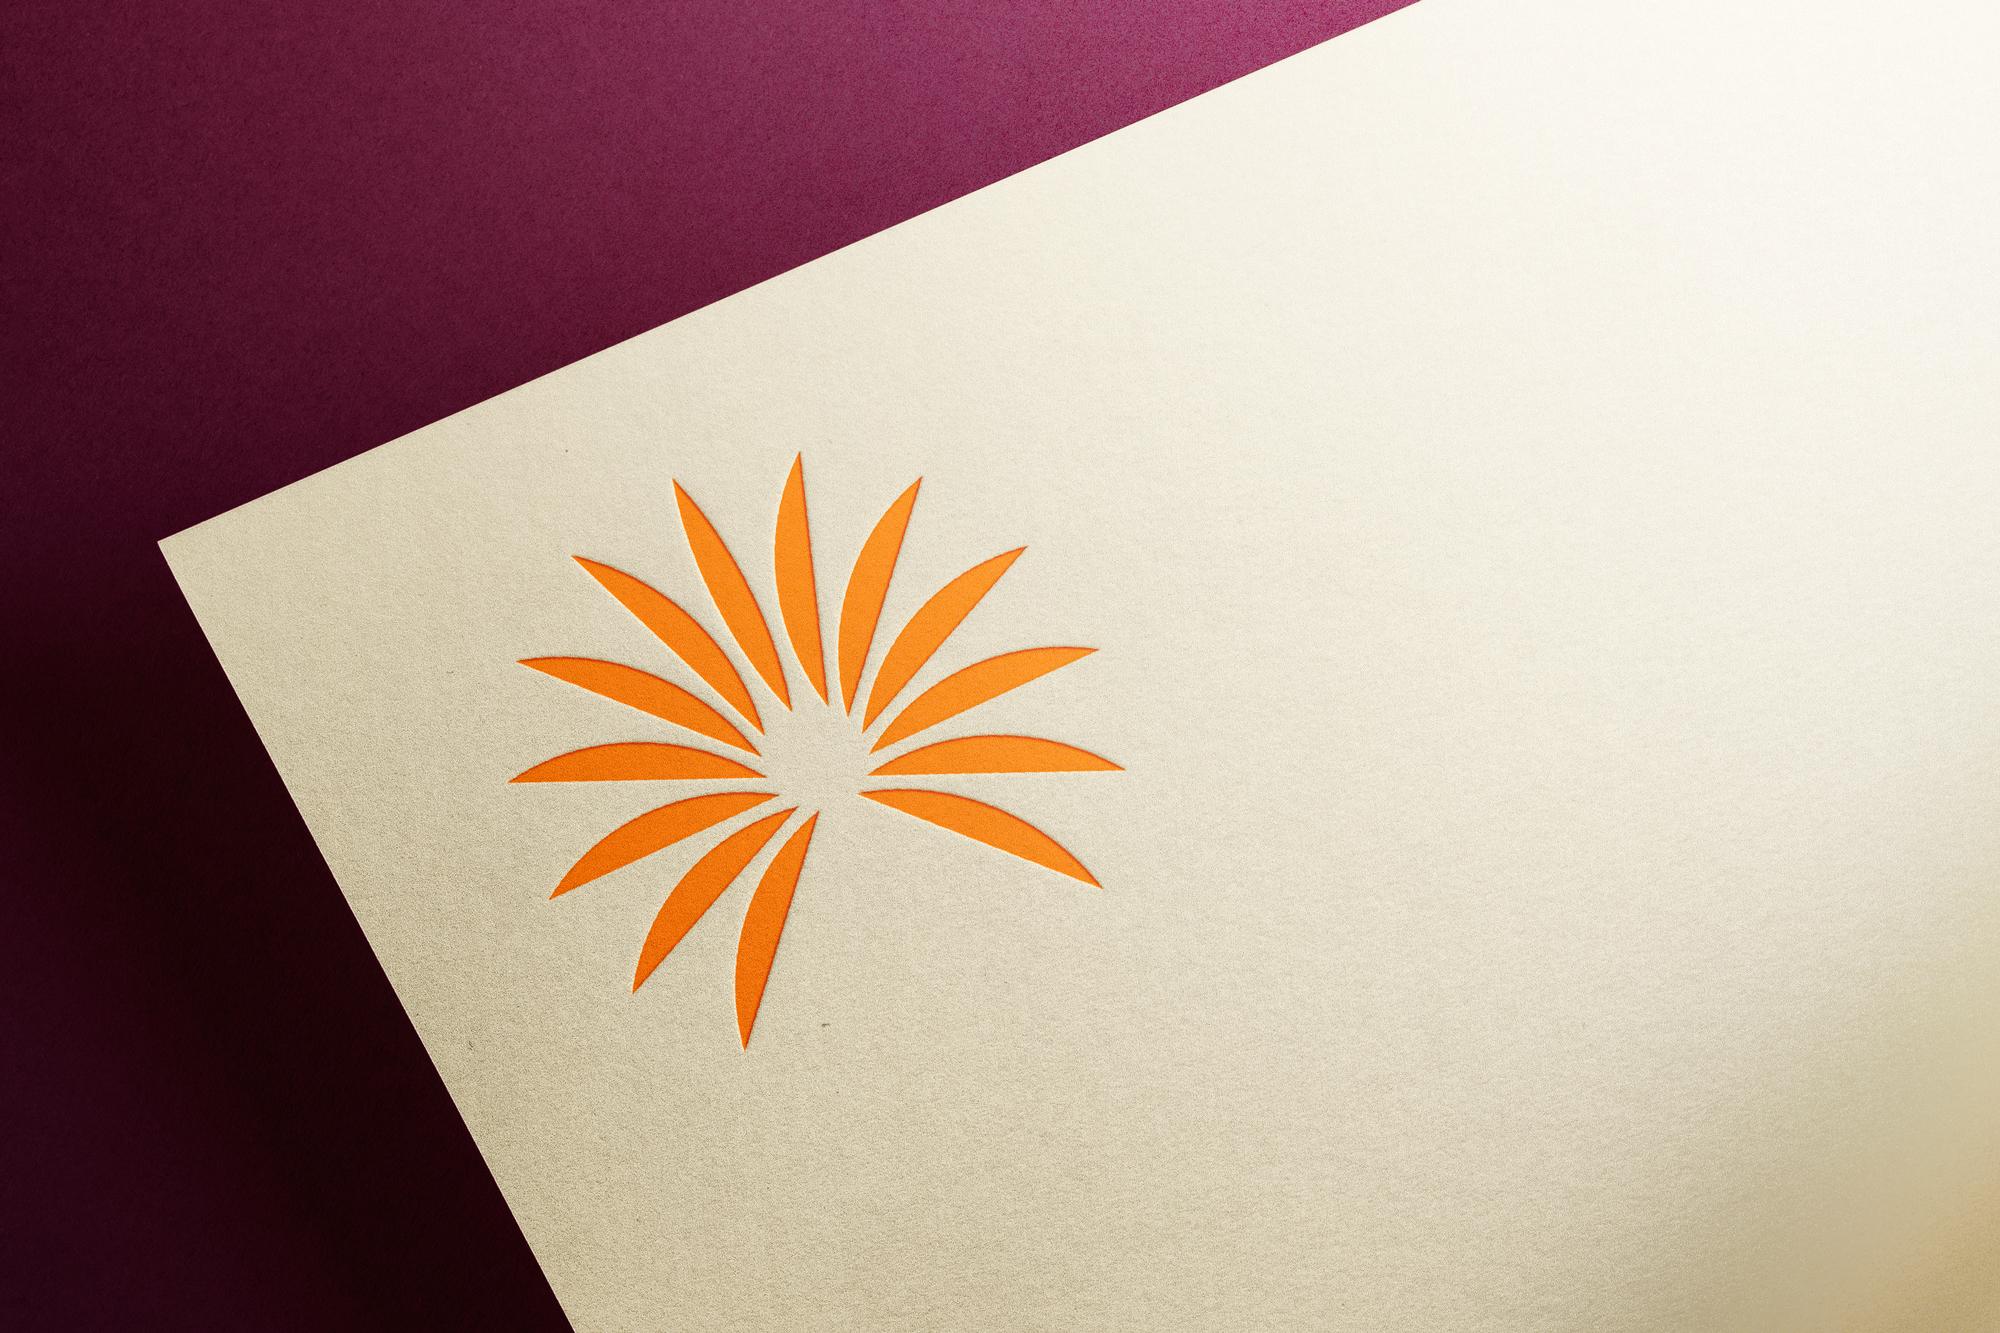 Hampton Brown logo symbol printed in orange on light paper